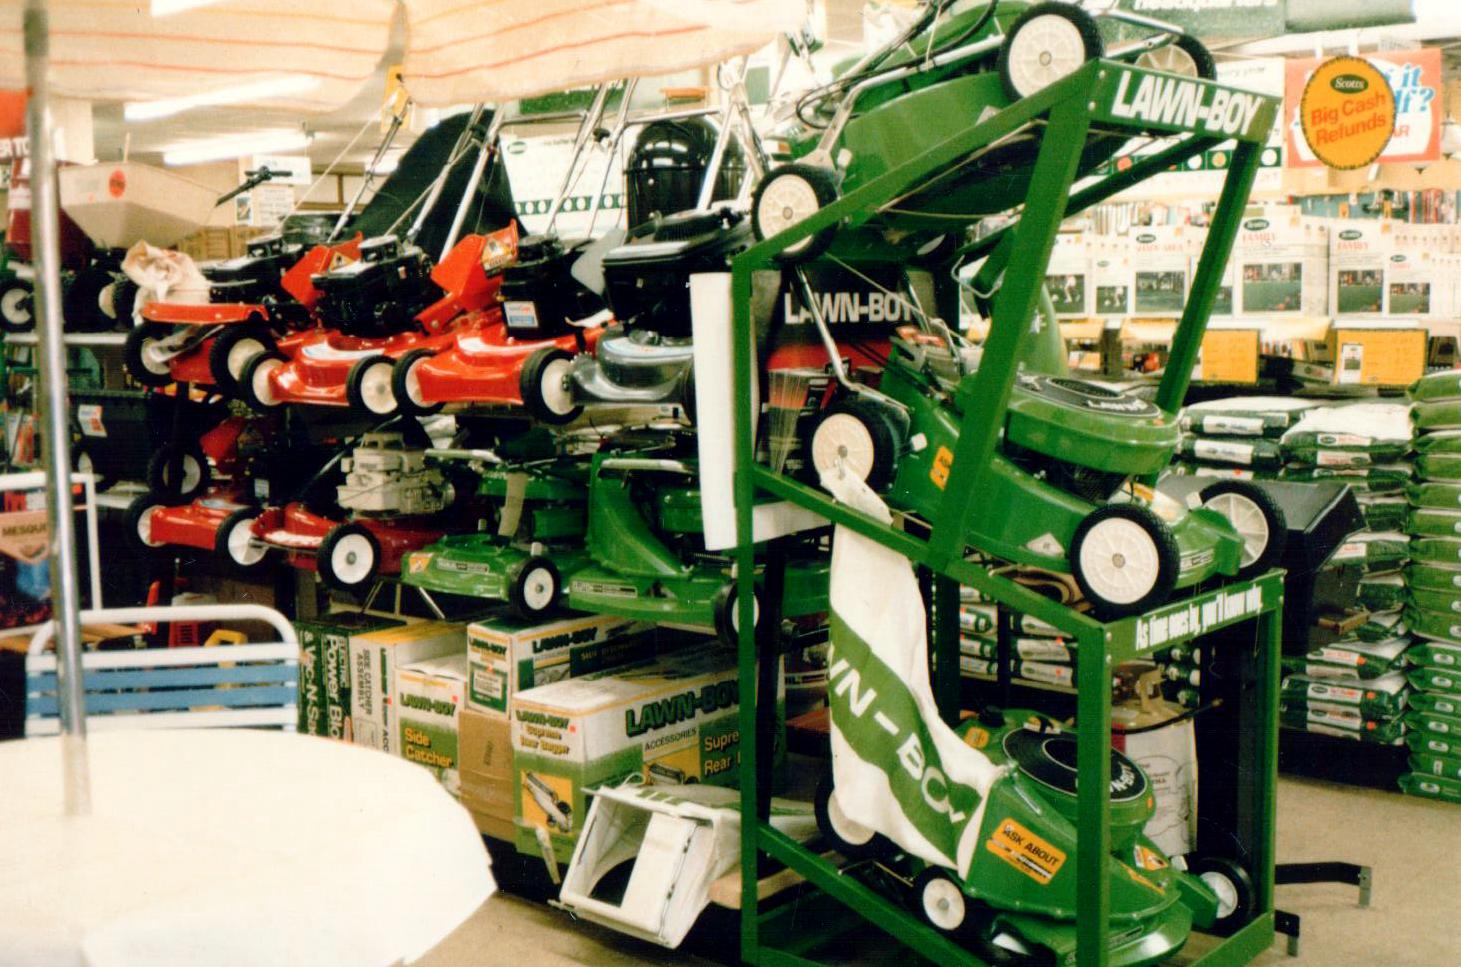 April 1966 - lawnboy mowers display.png